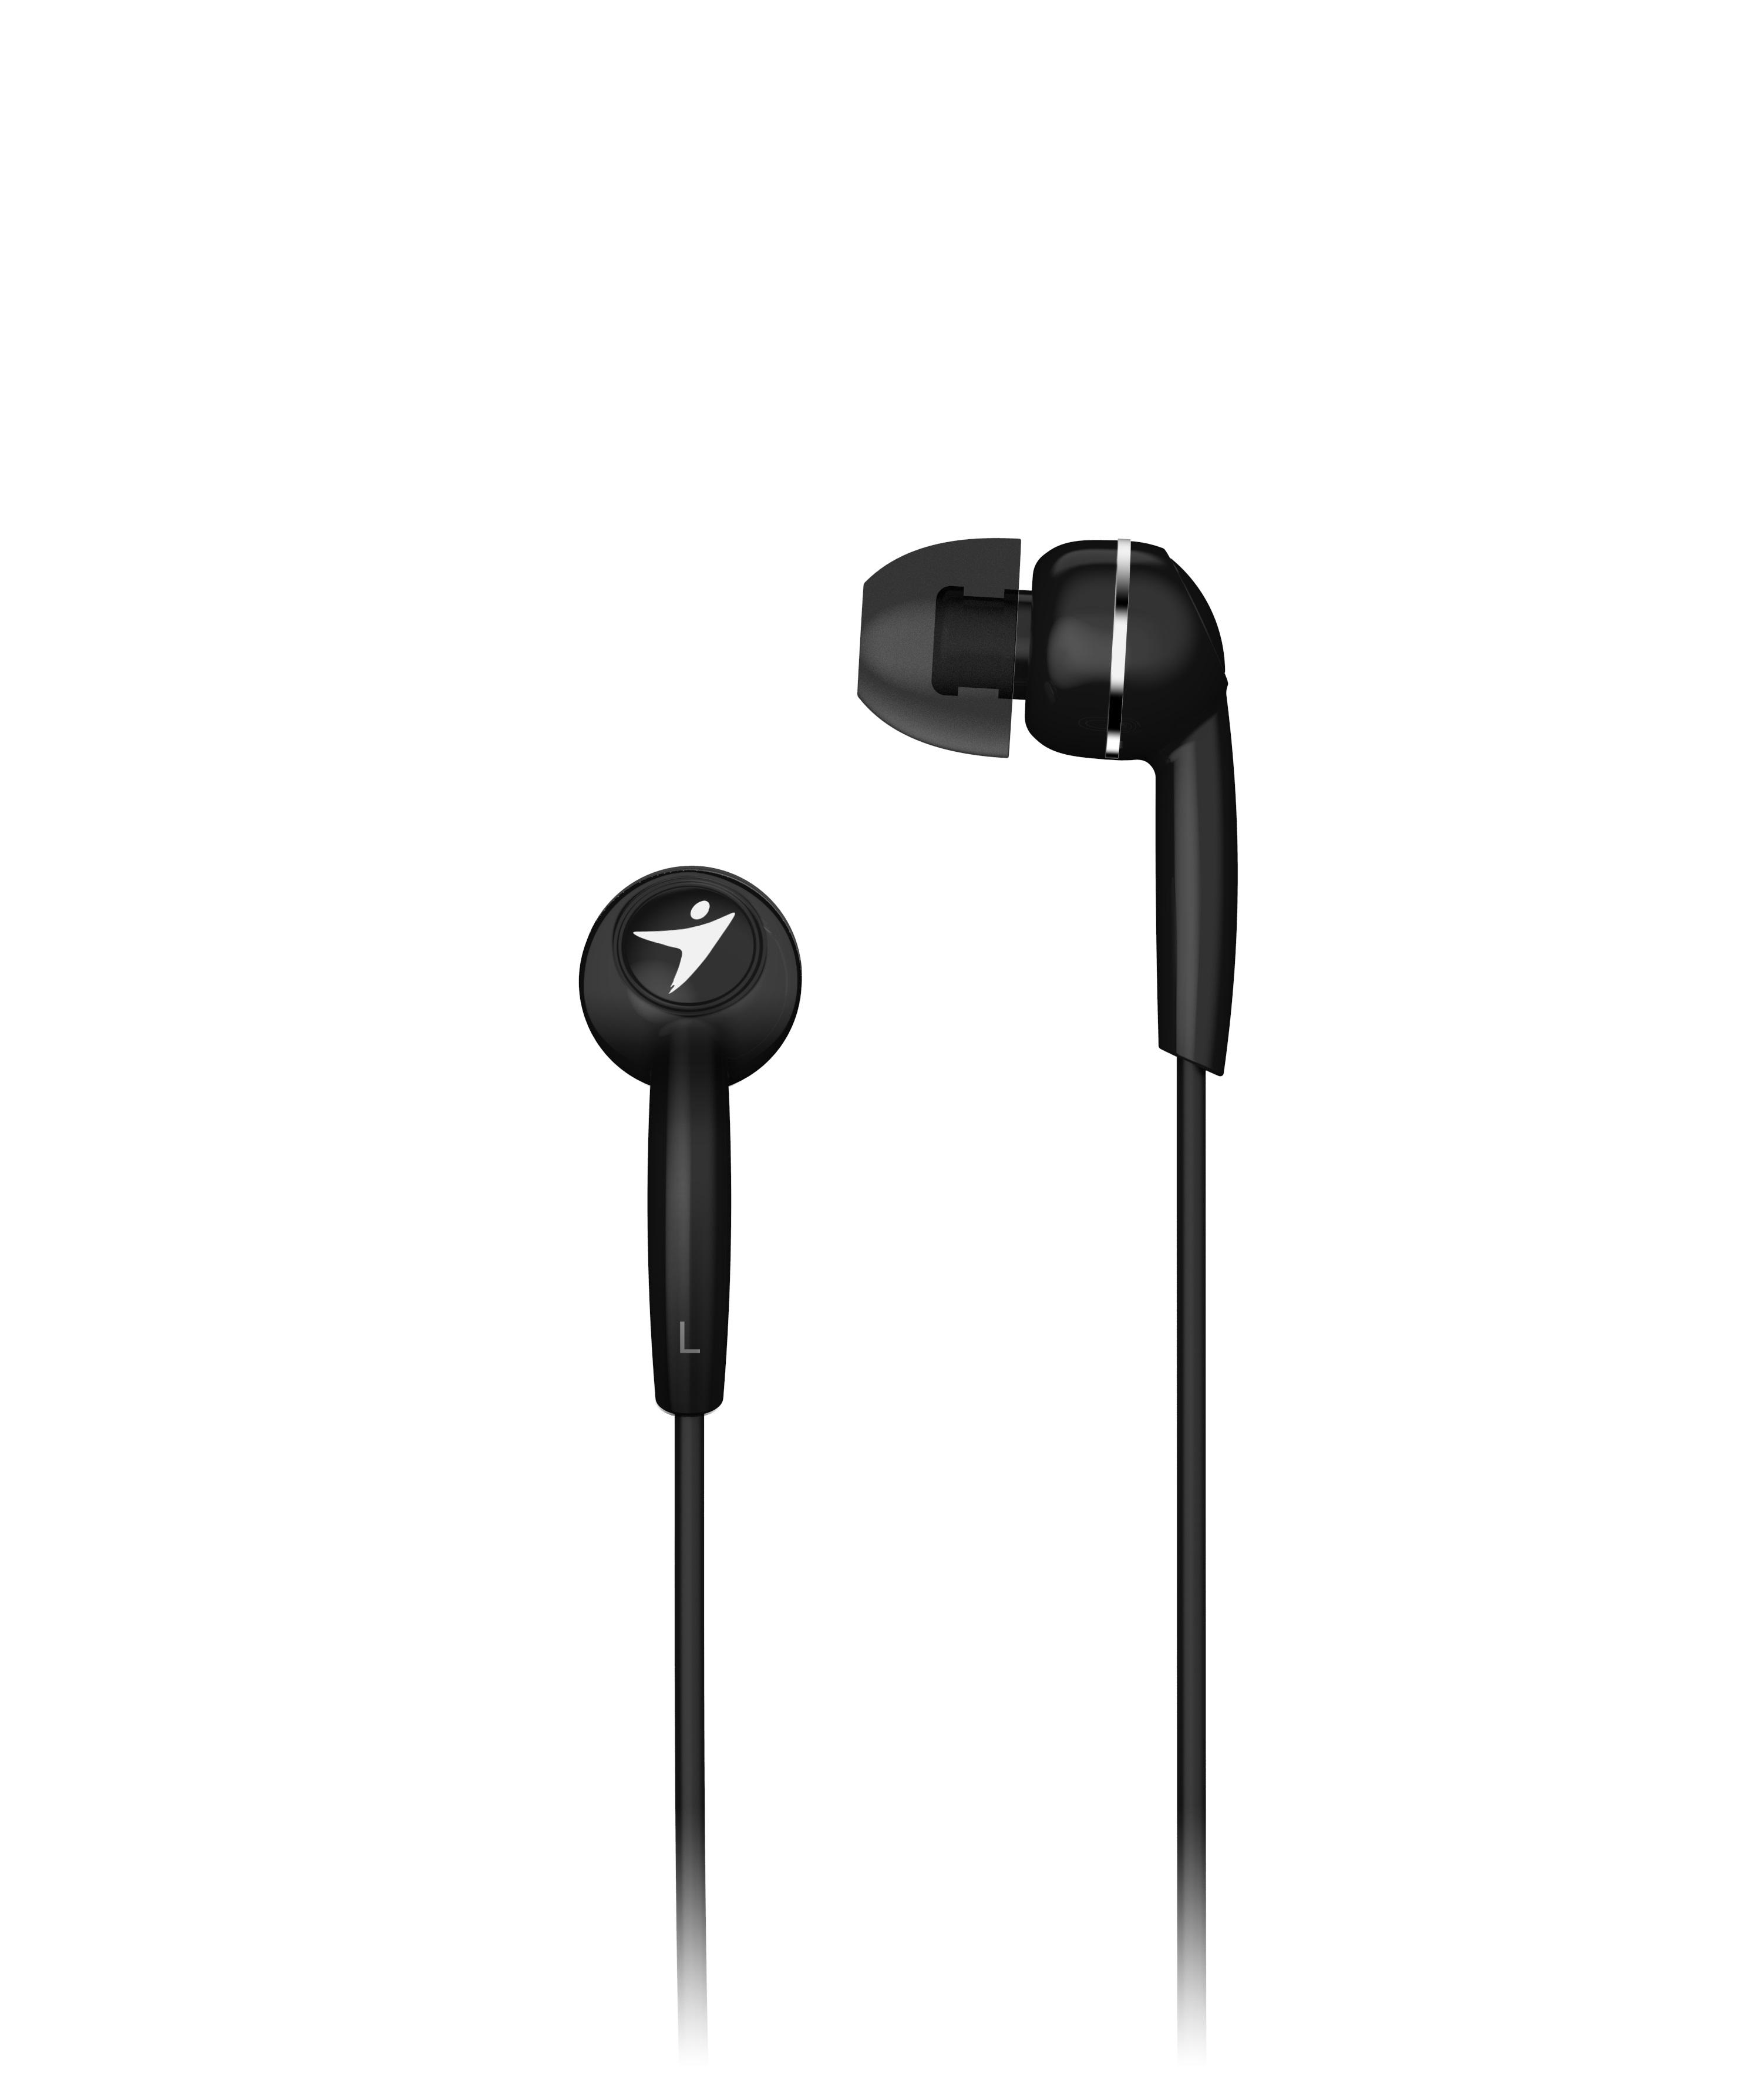 Sluchátka Genius HS-M320 mobile headset, black - 31710005412